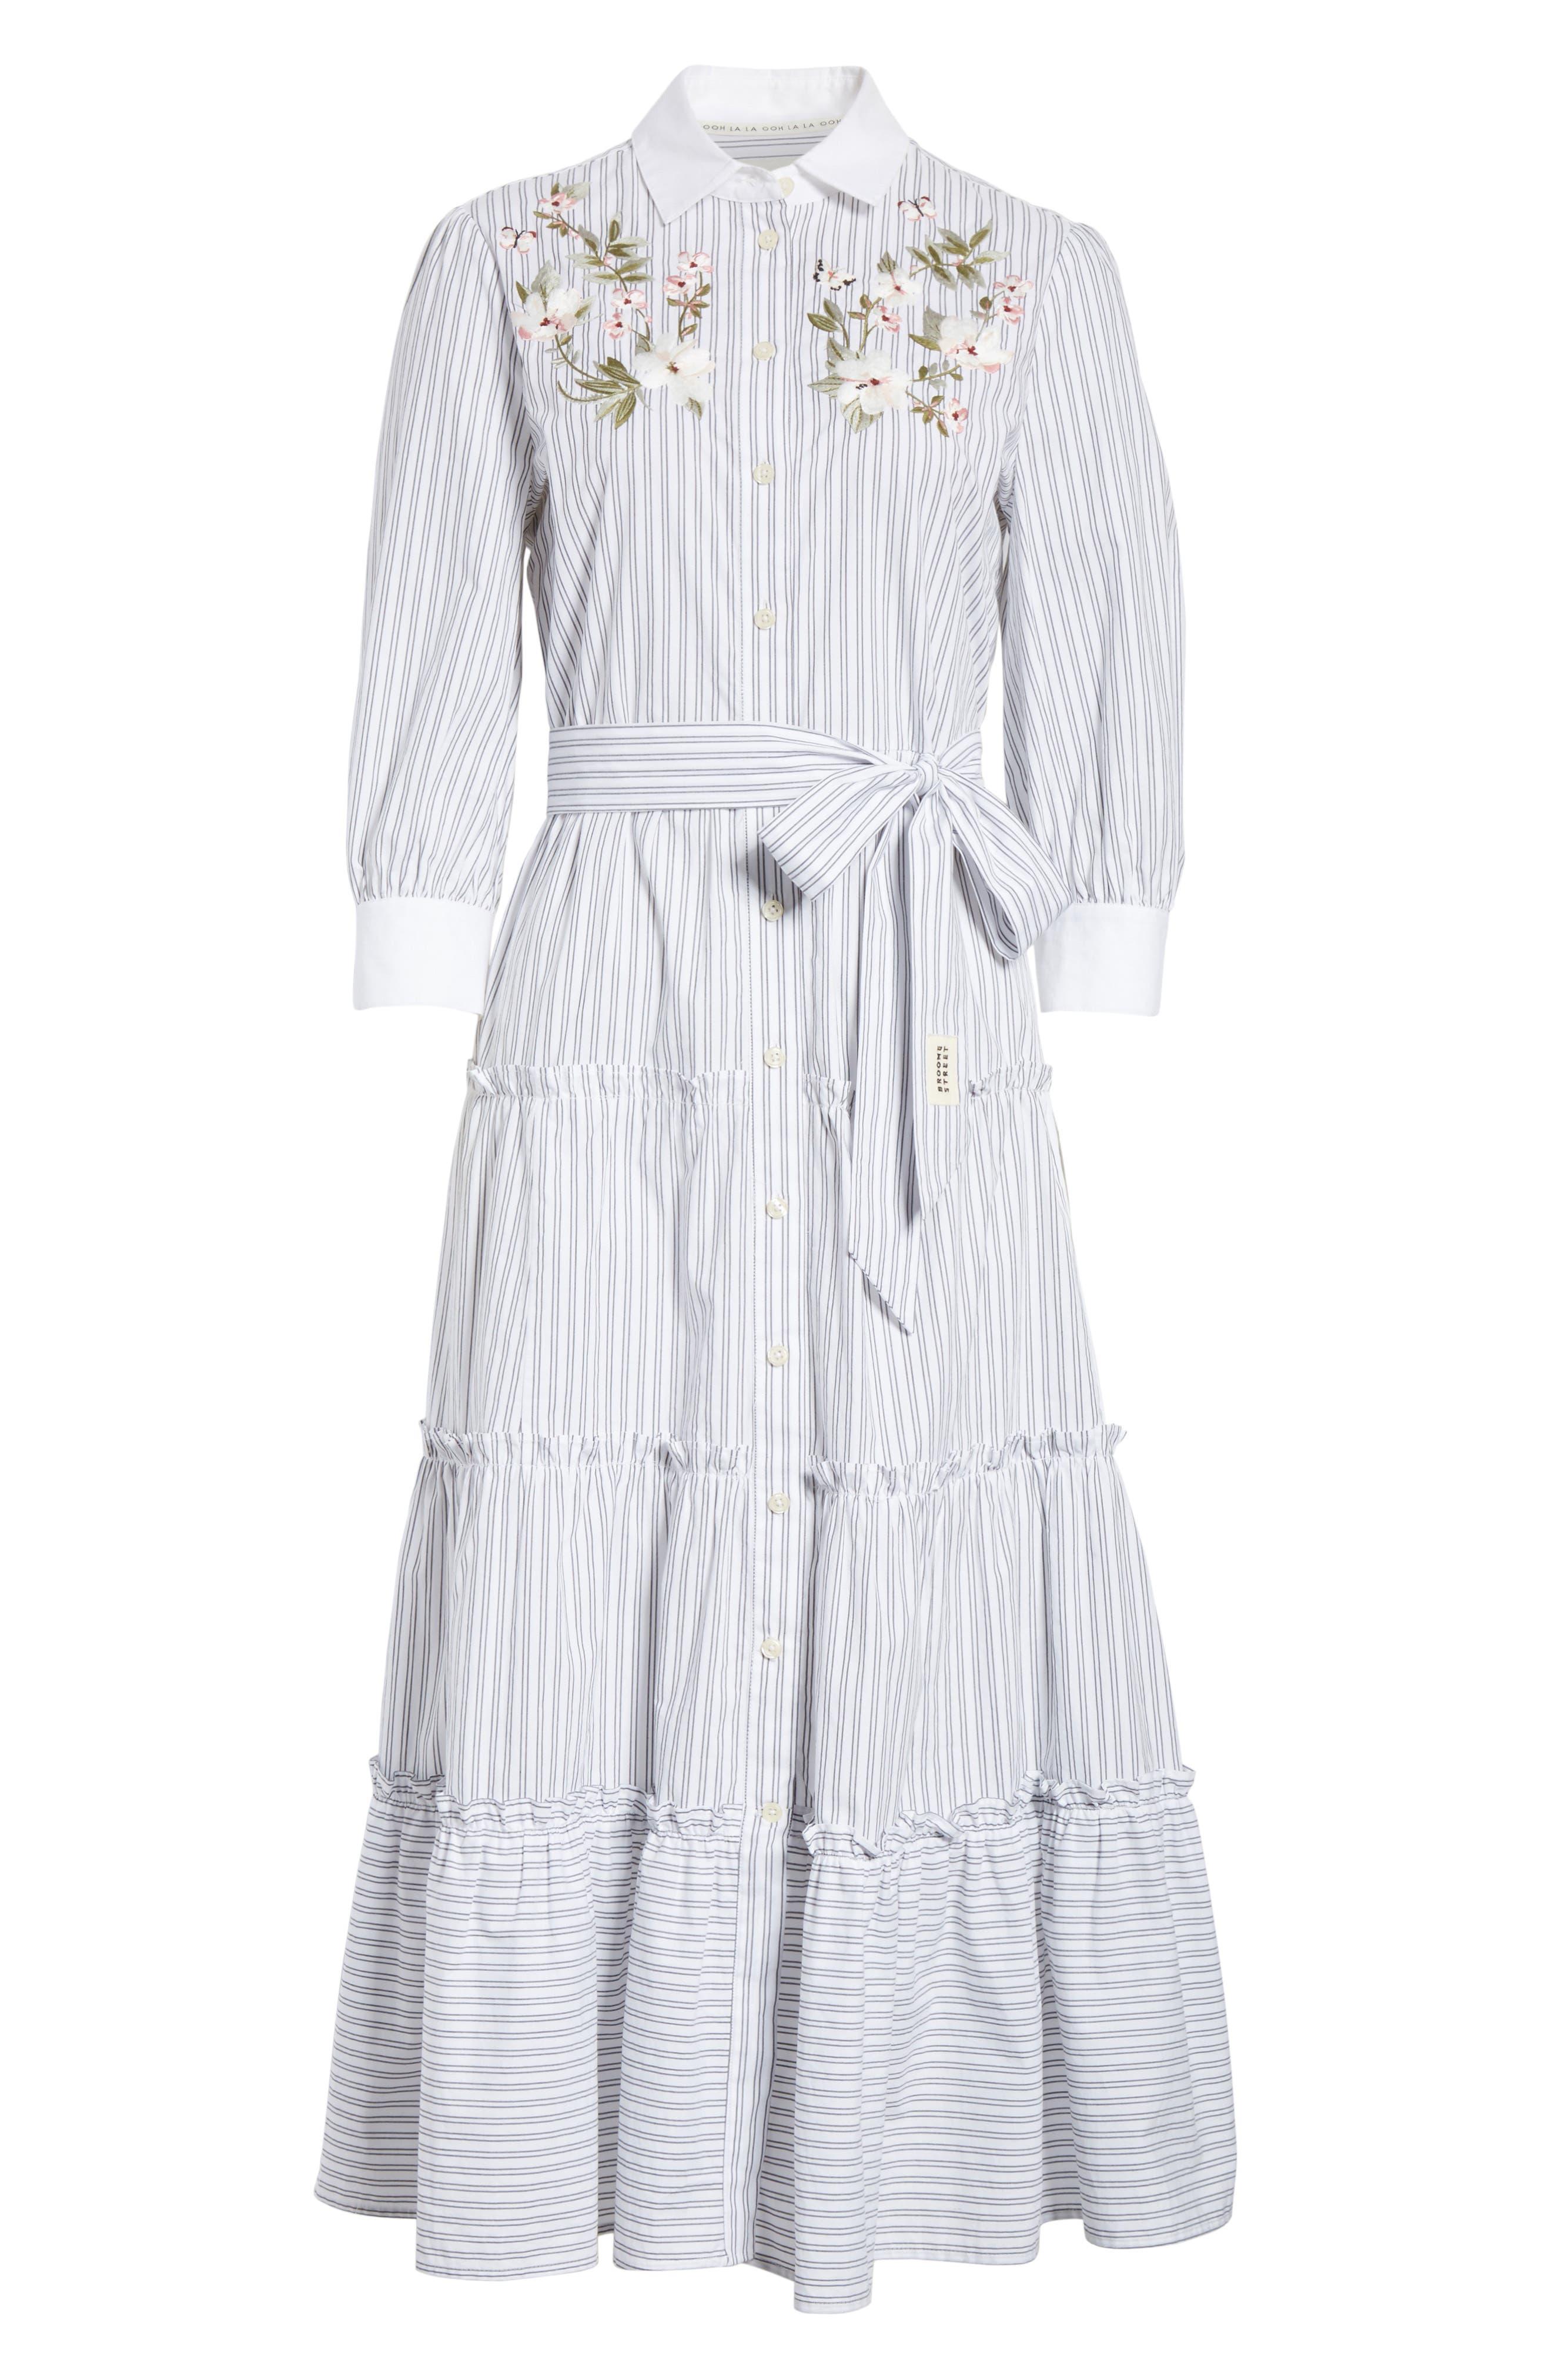 embroidered ruffle trim shirtdress,                             Alternate thumbnail 6, color,                             Fresh White/ Black